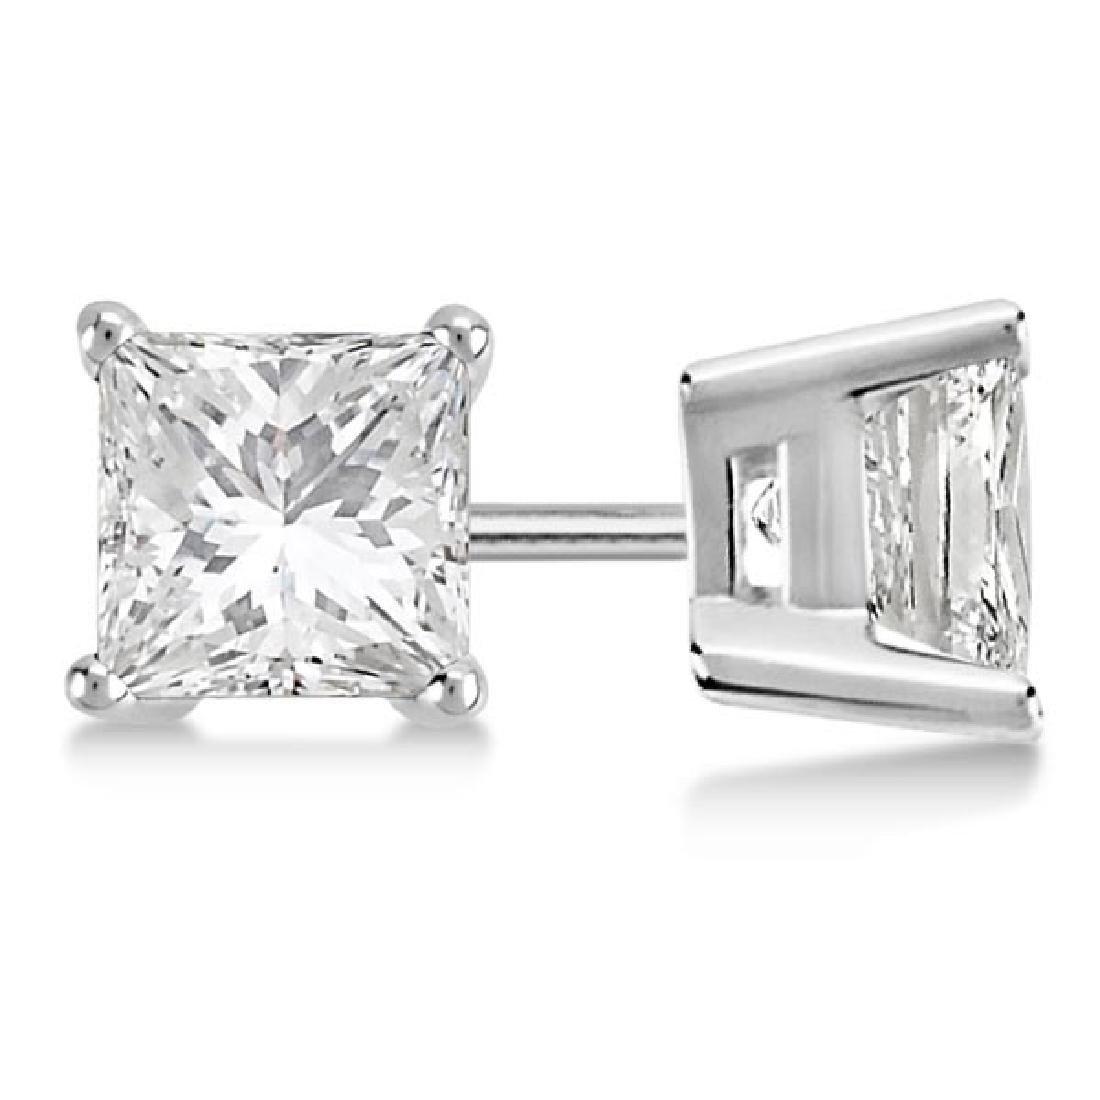 Certified 1.01 CTW Princess Diamond Stud Earrings F/SI2